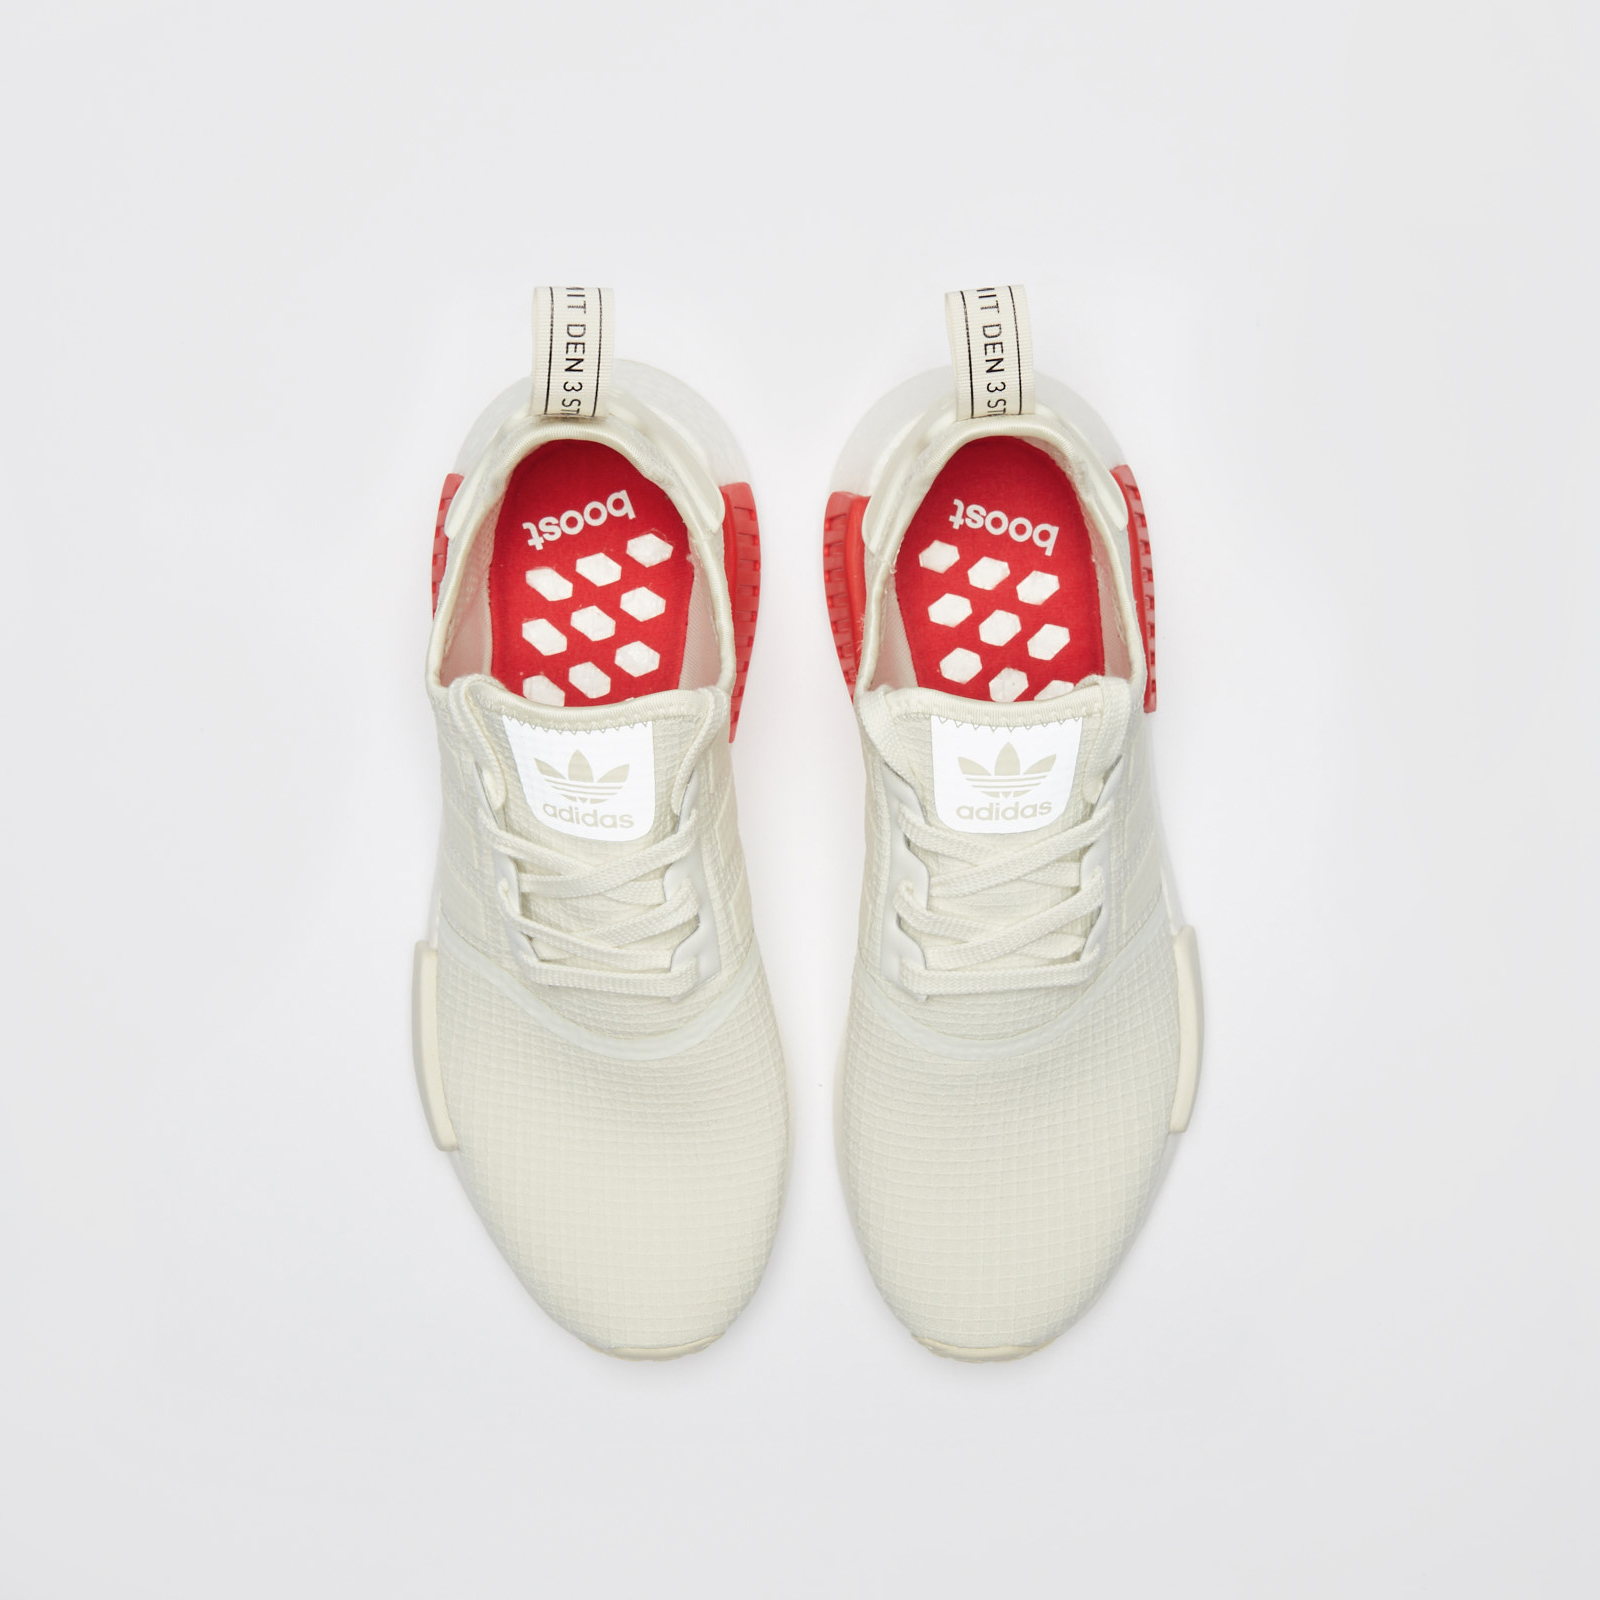 adidas NMD_R1 - B37619 - Sneakersnstuff